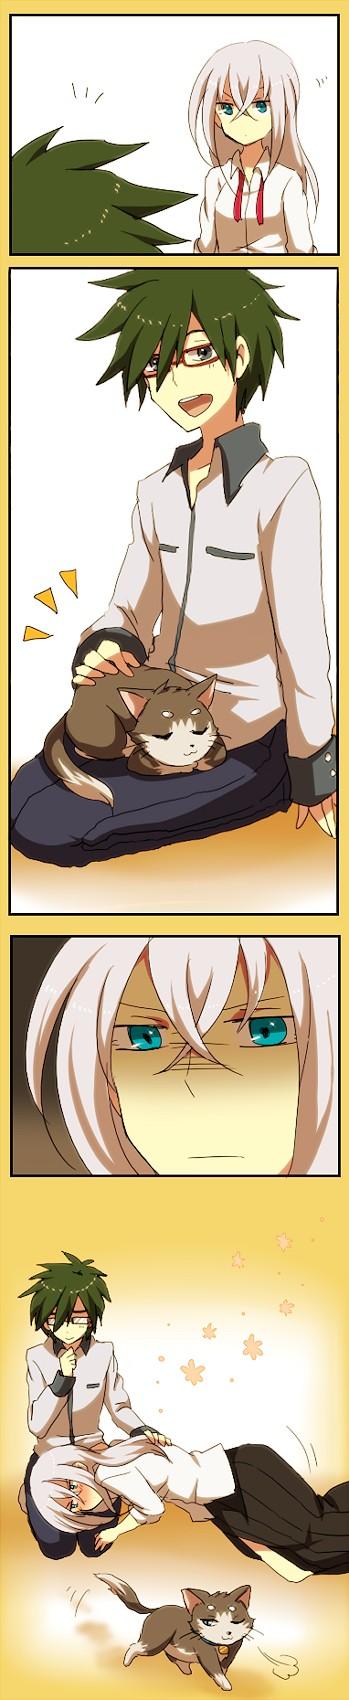 Tags: Anime, Akasata, Cardfight!! Vanguard, Nitta Shin, Tokura Misaki, Tenchou Dairi, Pixiv, Fanart